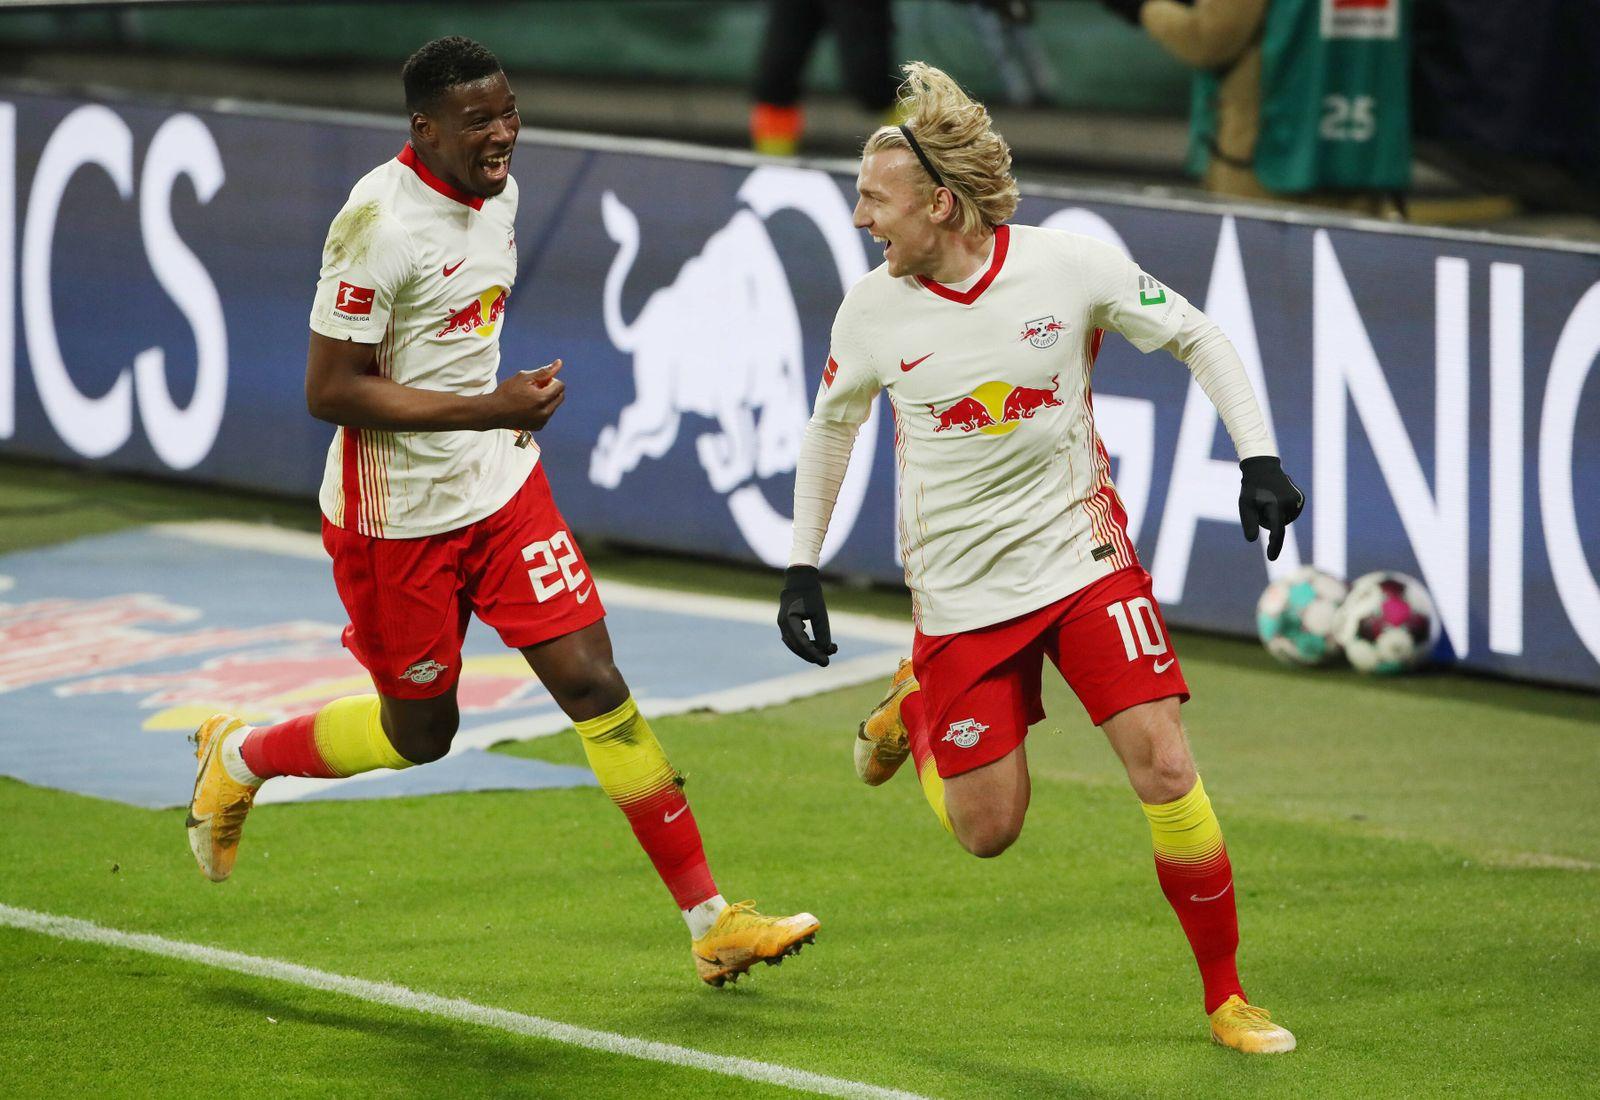 Nordi Mukiele, Emil Forsberg 1:0 / Freude / Emotion / jubelnd / Jubel nach 1:0 / / Fußball Fussball / DFL Bundesliga He